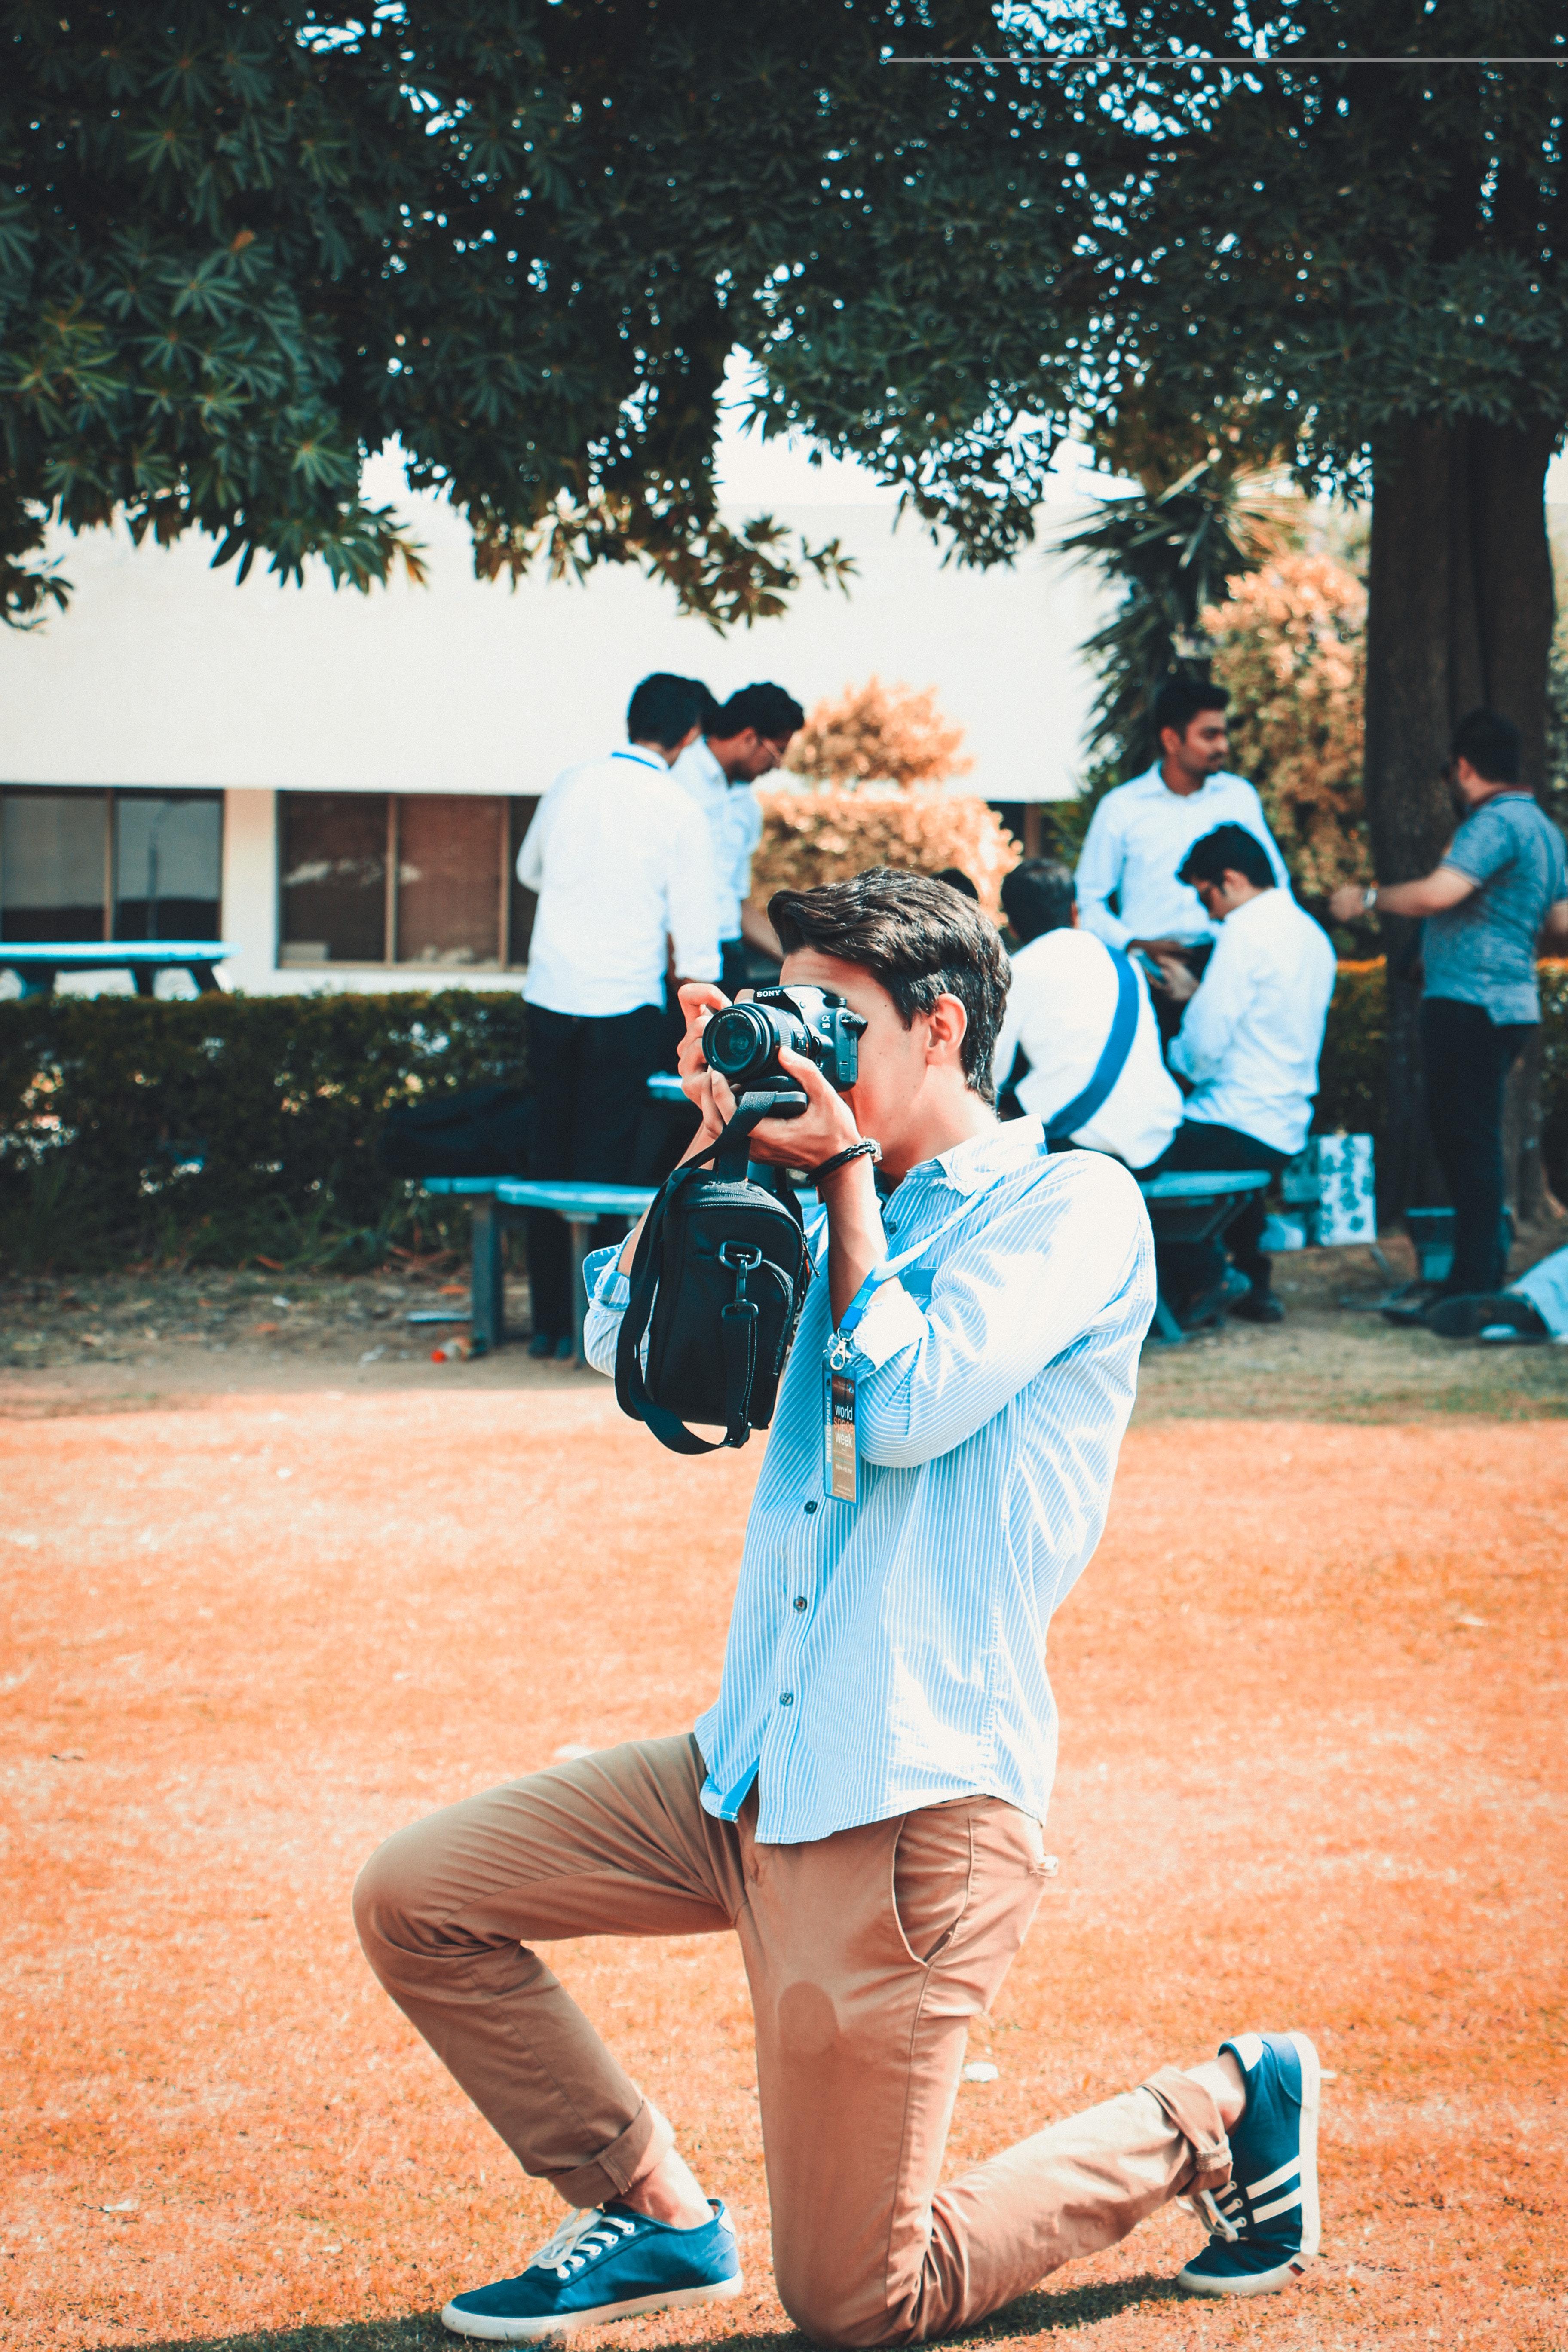 Man Holding a Black Dslr Camera, Camera, Daytime, Friends, Men, HQ Photo